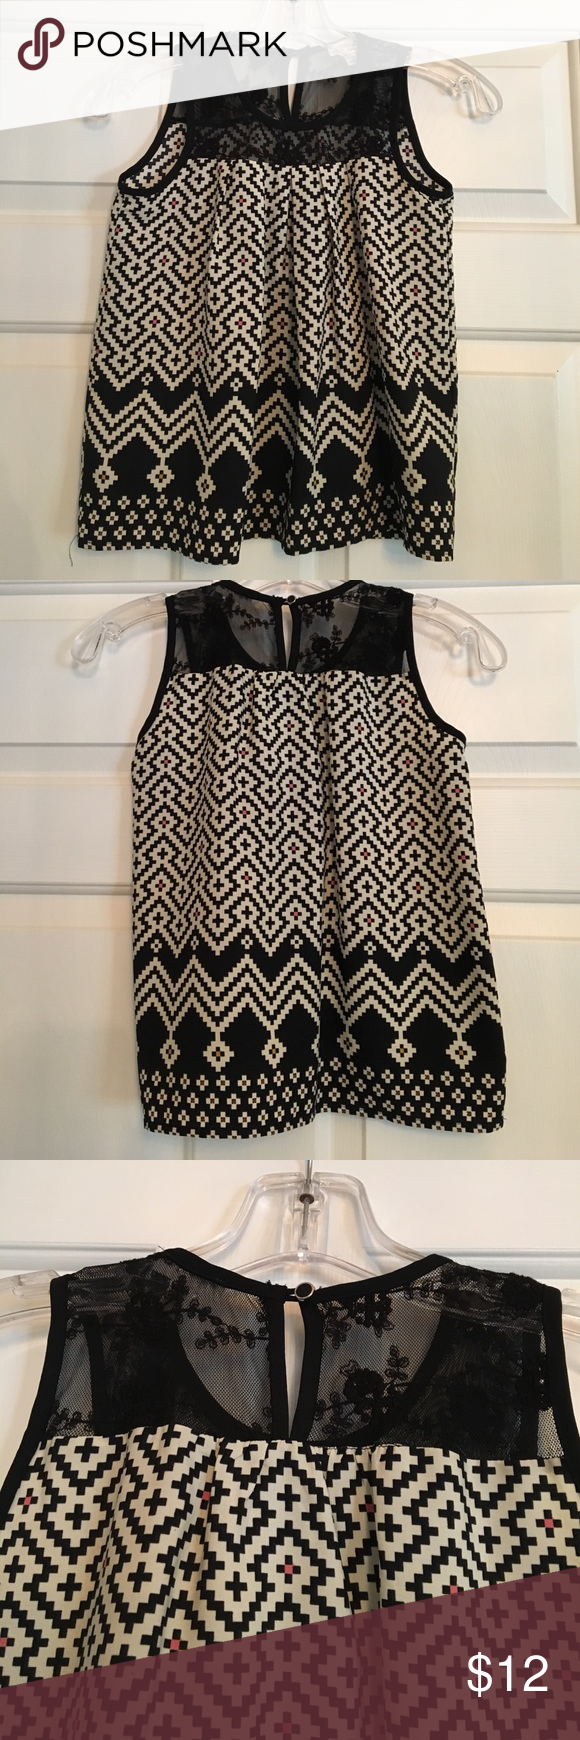 M boutique lace dress  Girlus boutiquestyle tank Size M  Lace detail at top Single